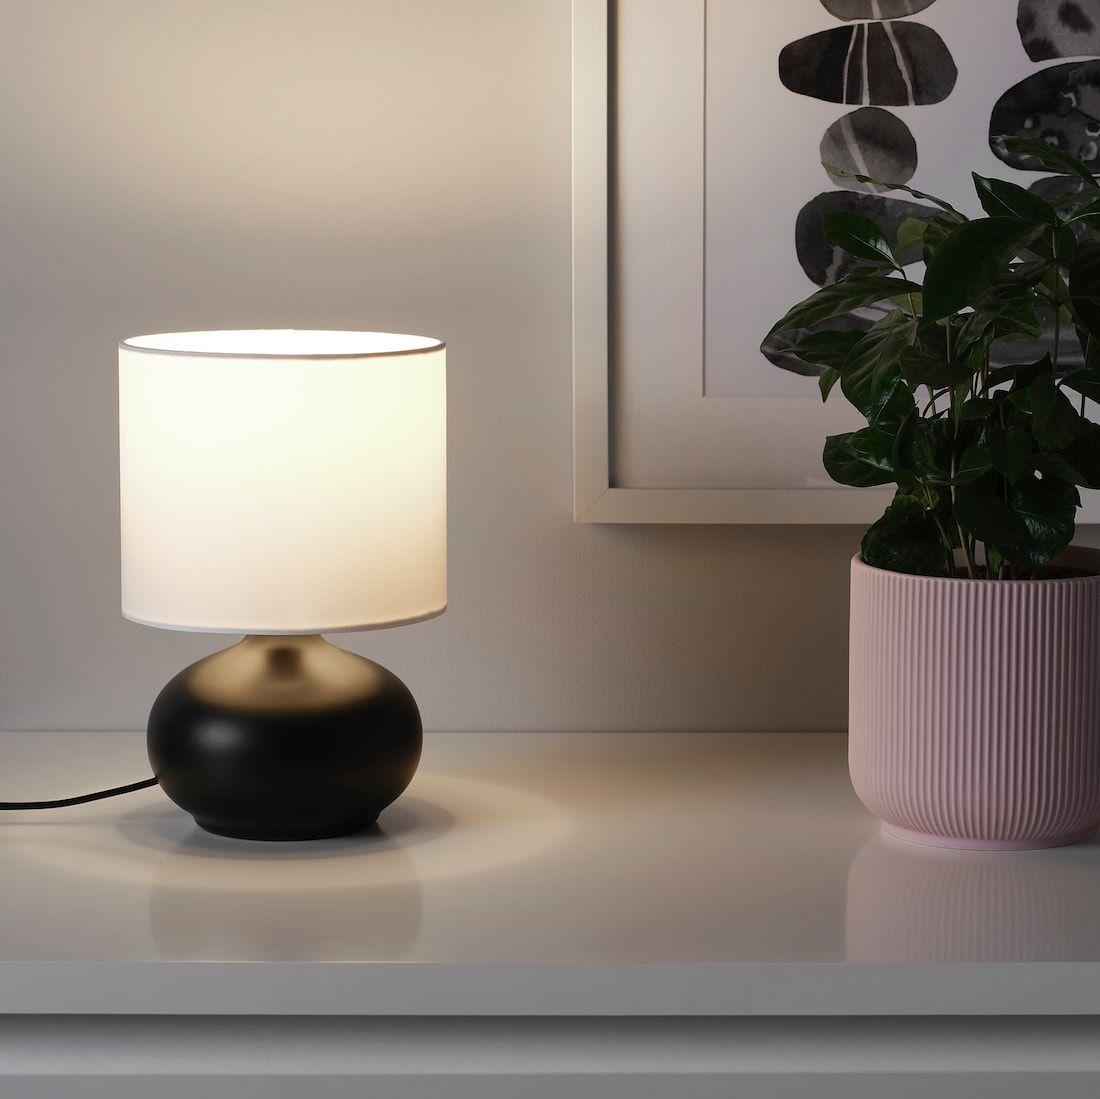 Tvarfot Table Lamp Black White Ikea In 2020 Black Table Lamps Small Table Lamp Table Lamp